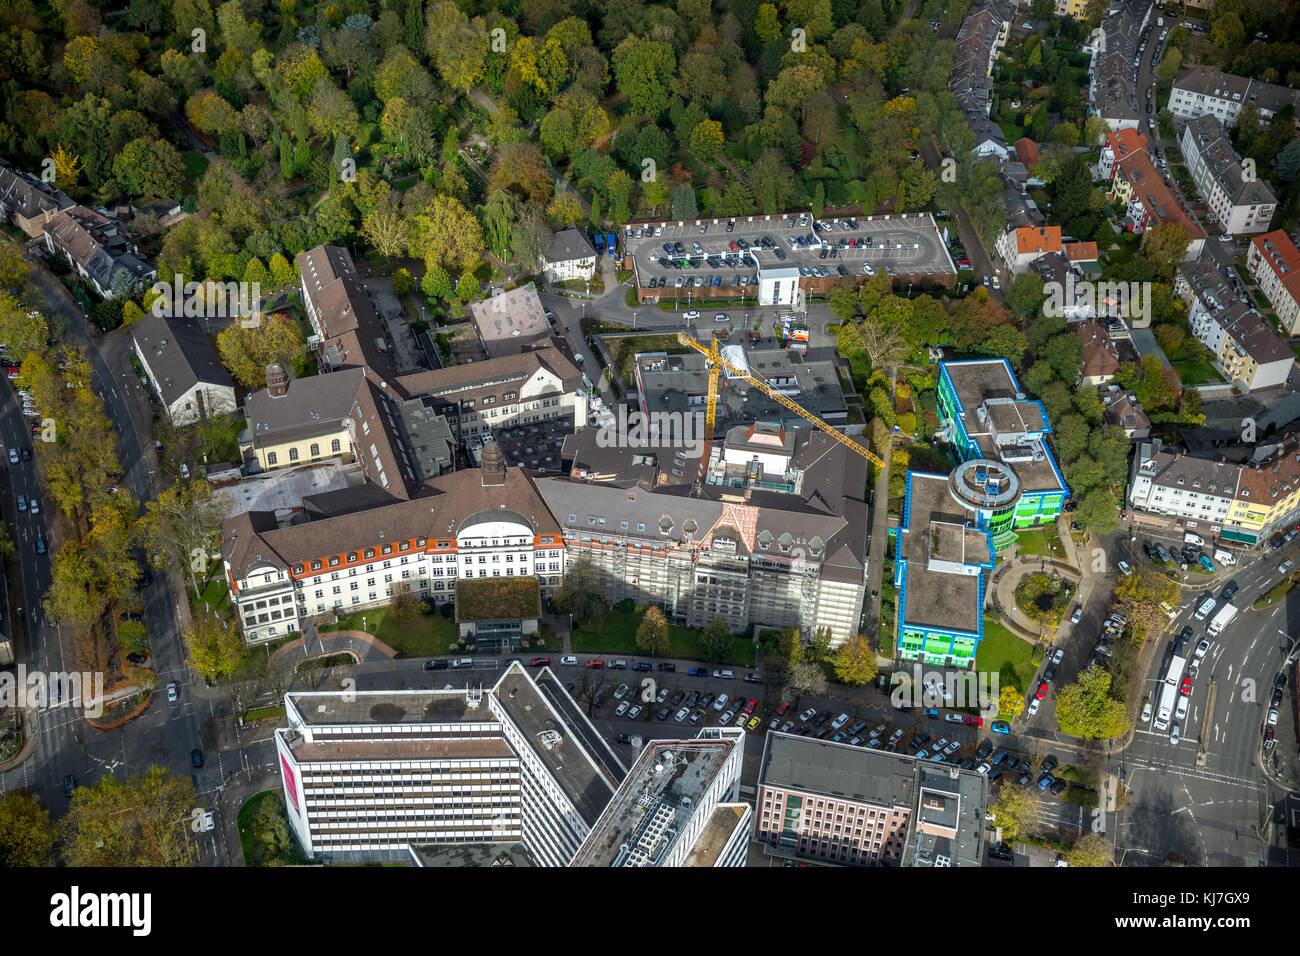 Elisabeth Hospital, Academic Teaching Hospital of the University of Duisburg-Essen, Huttrop, Social Pediatric Center, - Stock Image